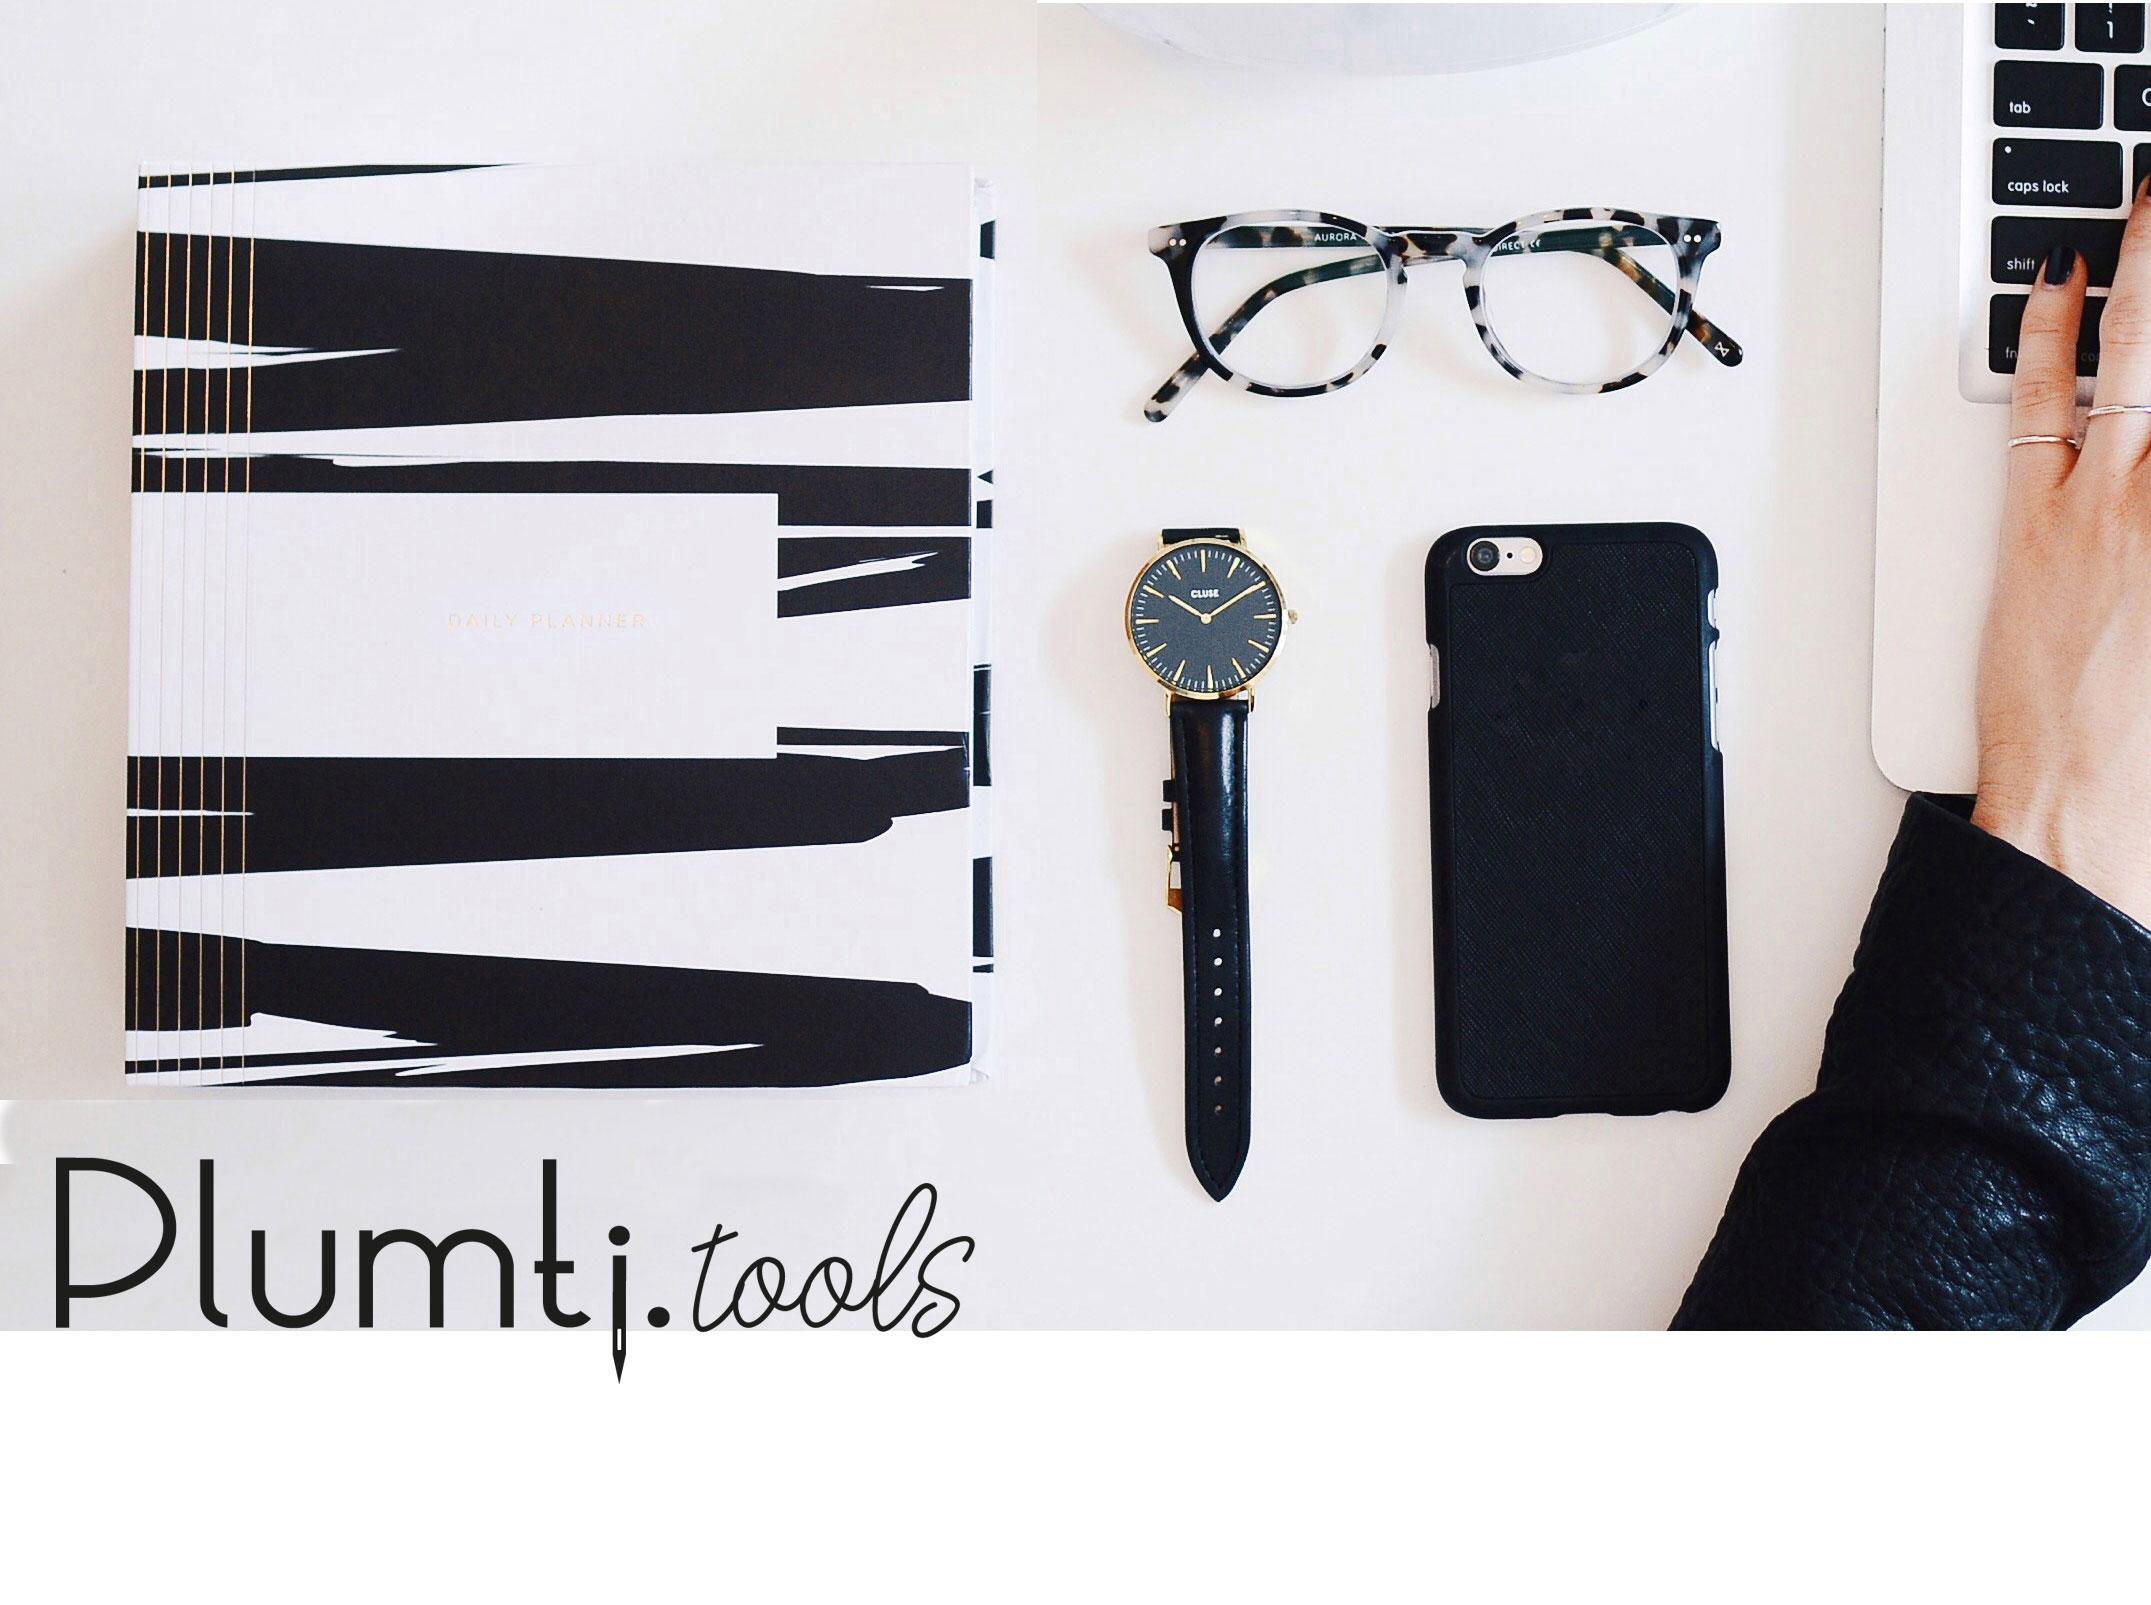 plumti.tools